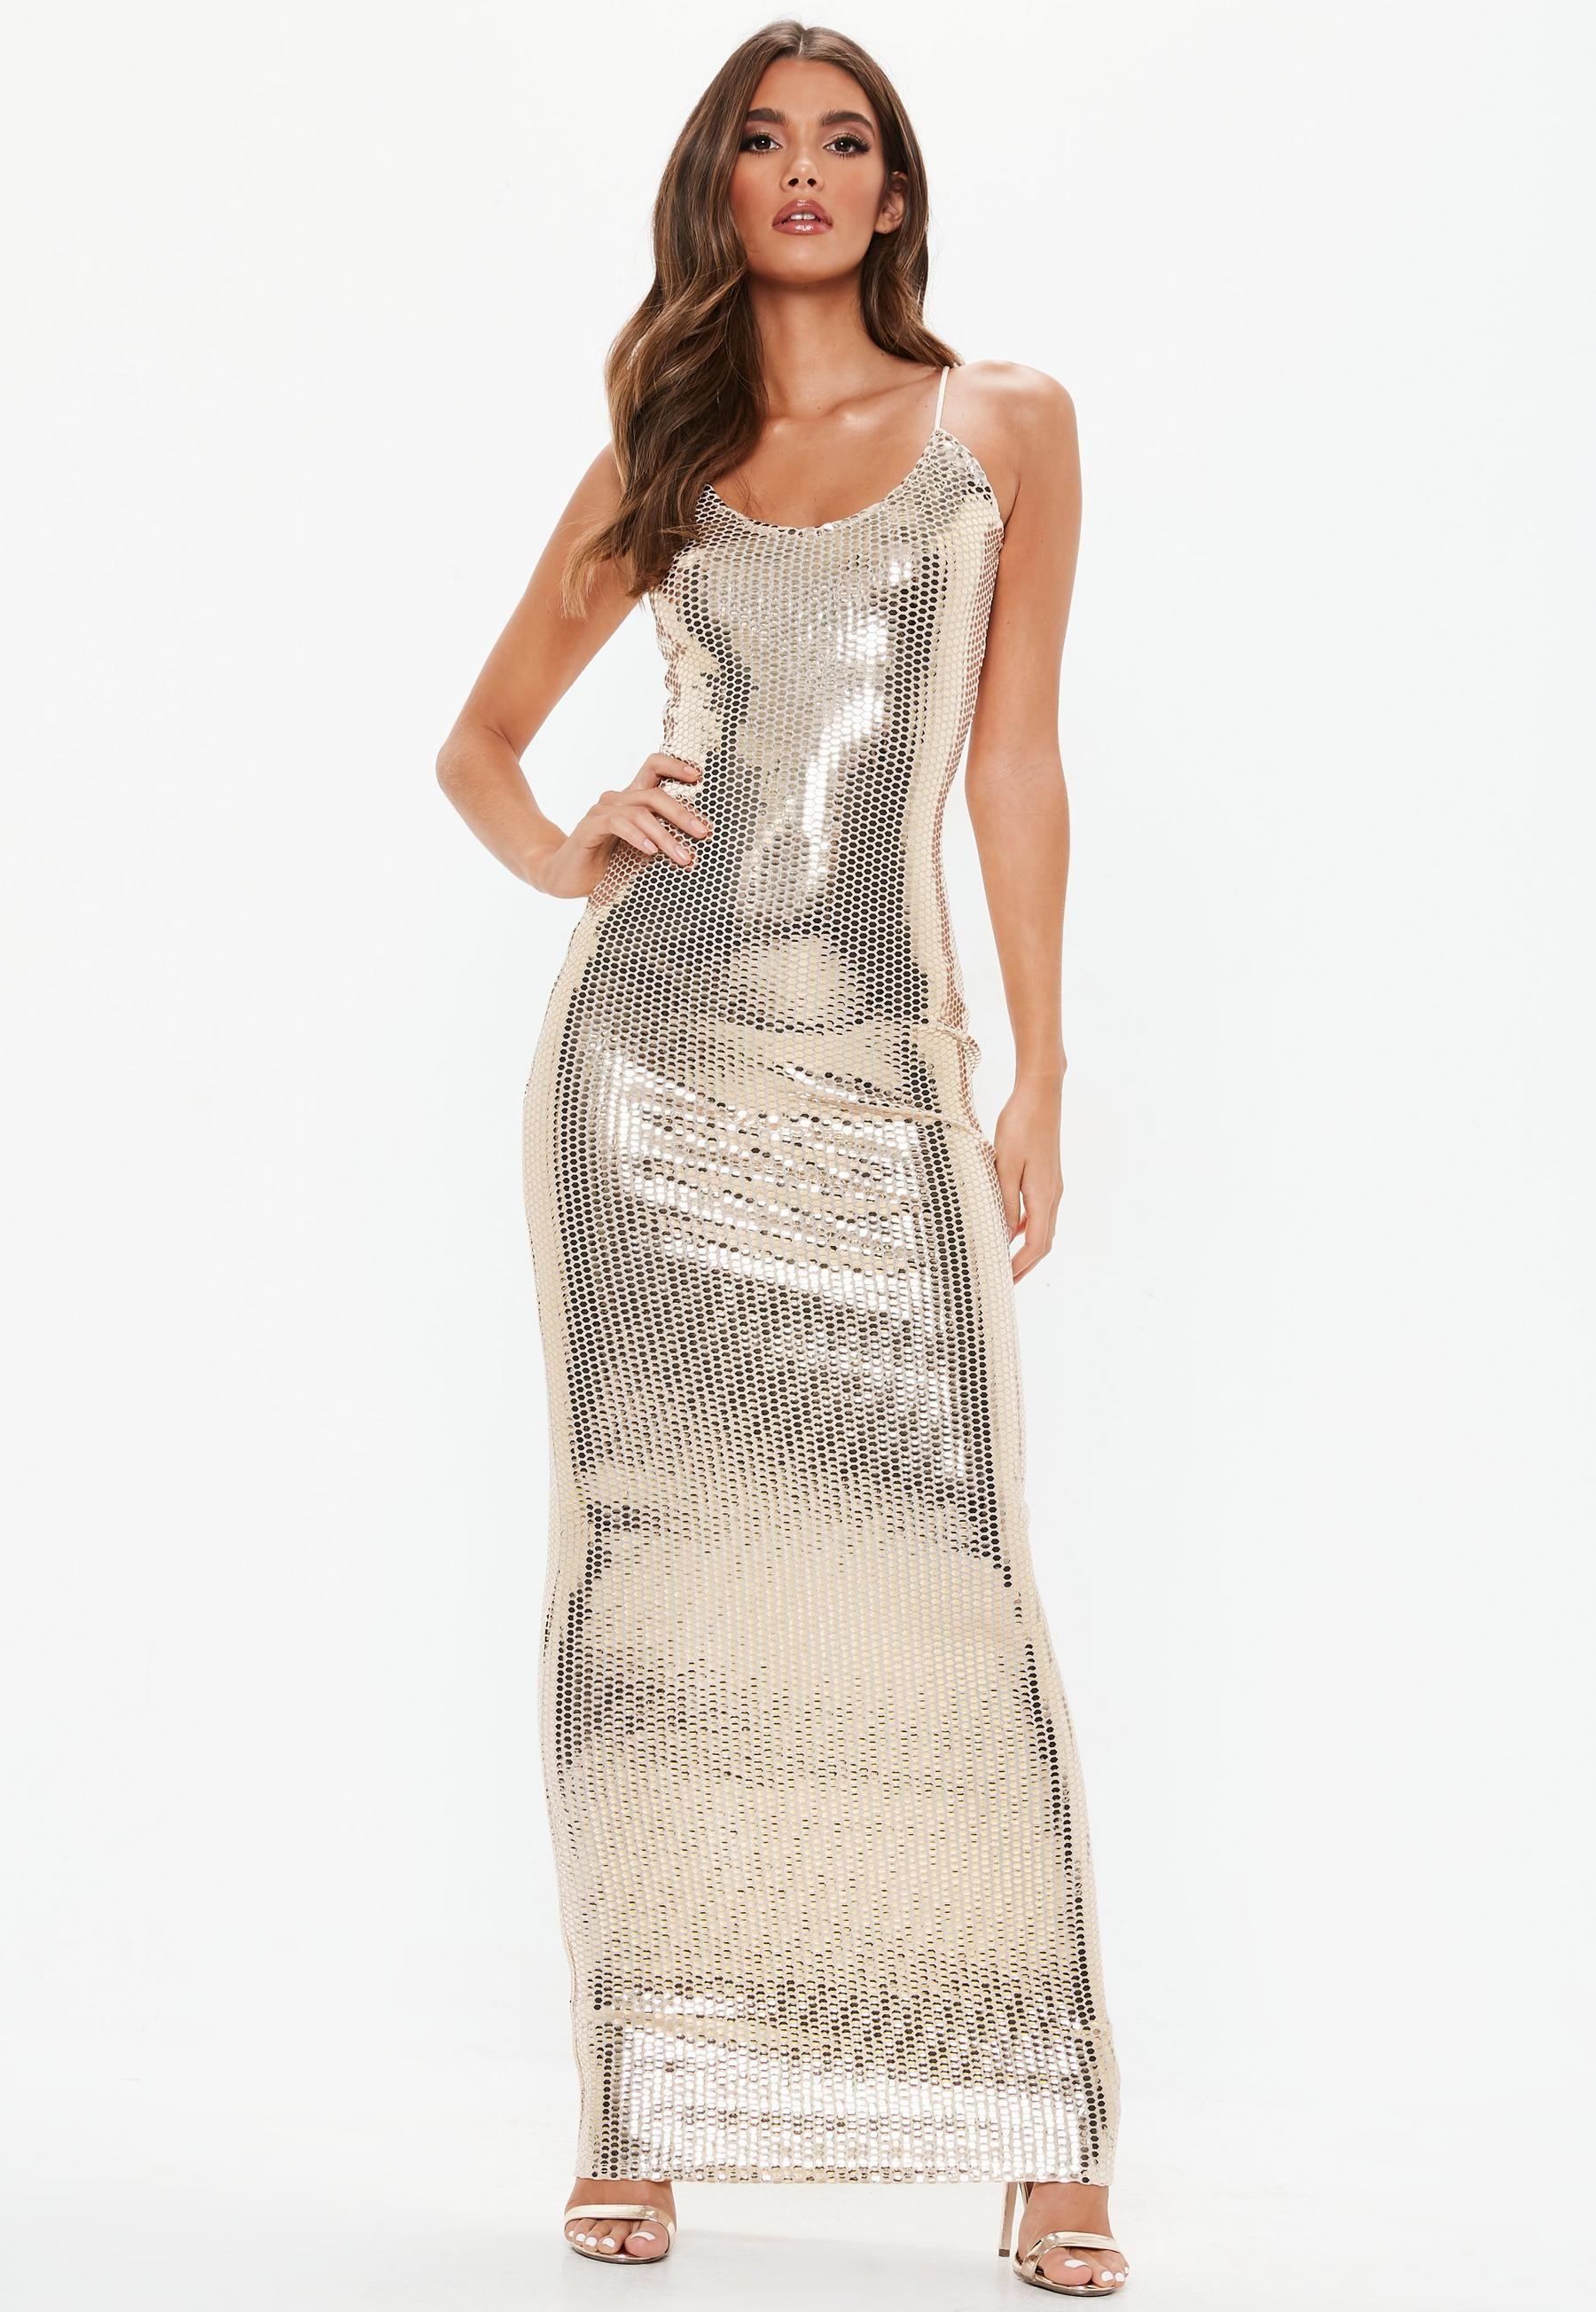 Gold Strappy Sequin Maxi Dress Sequin Maxi Dress Plunge Maxi Dress Girls Maxi Dresses [ 1180 x 740 Pixel ]